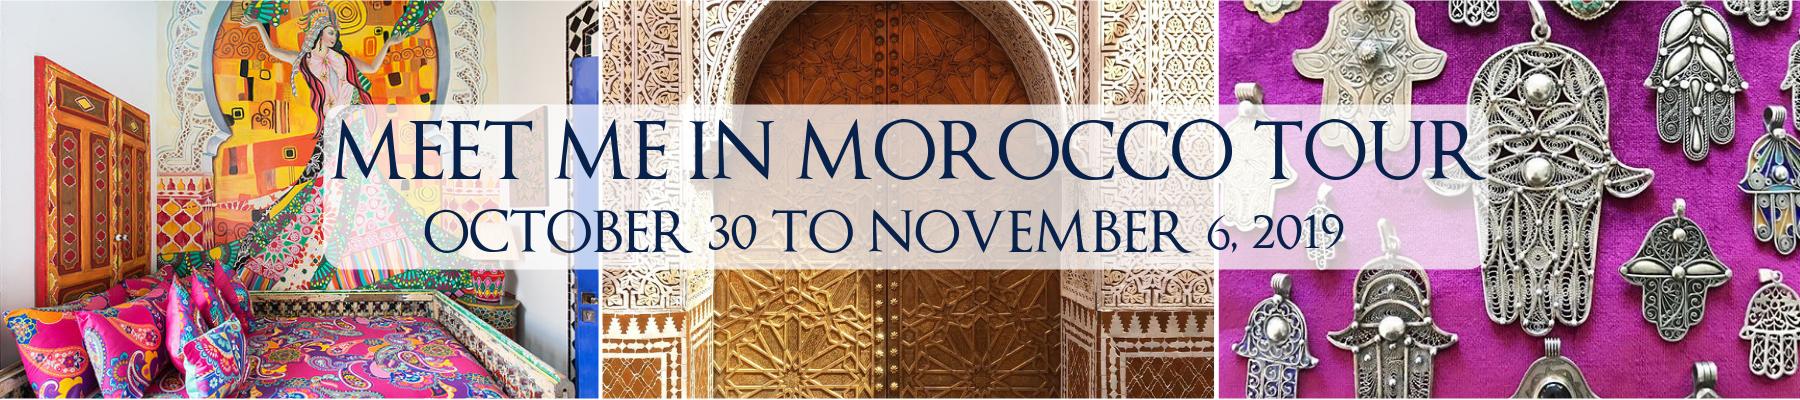 meet-me-banner-2019-morocco-final.png